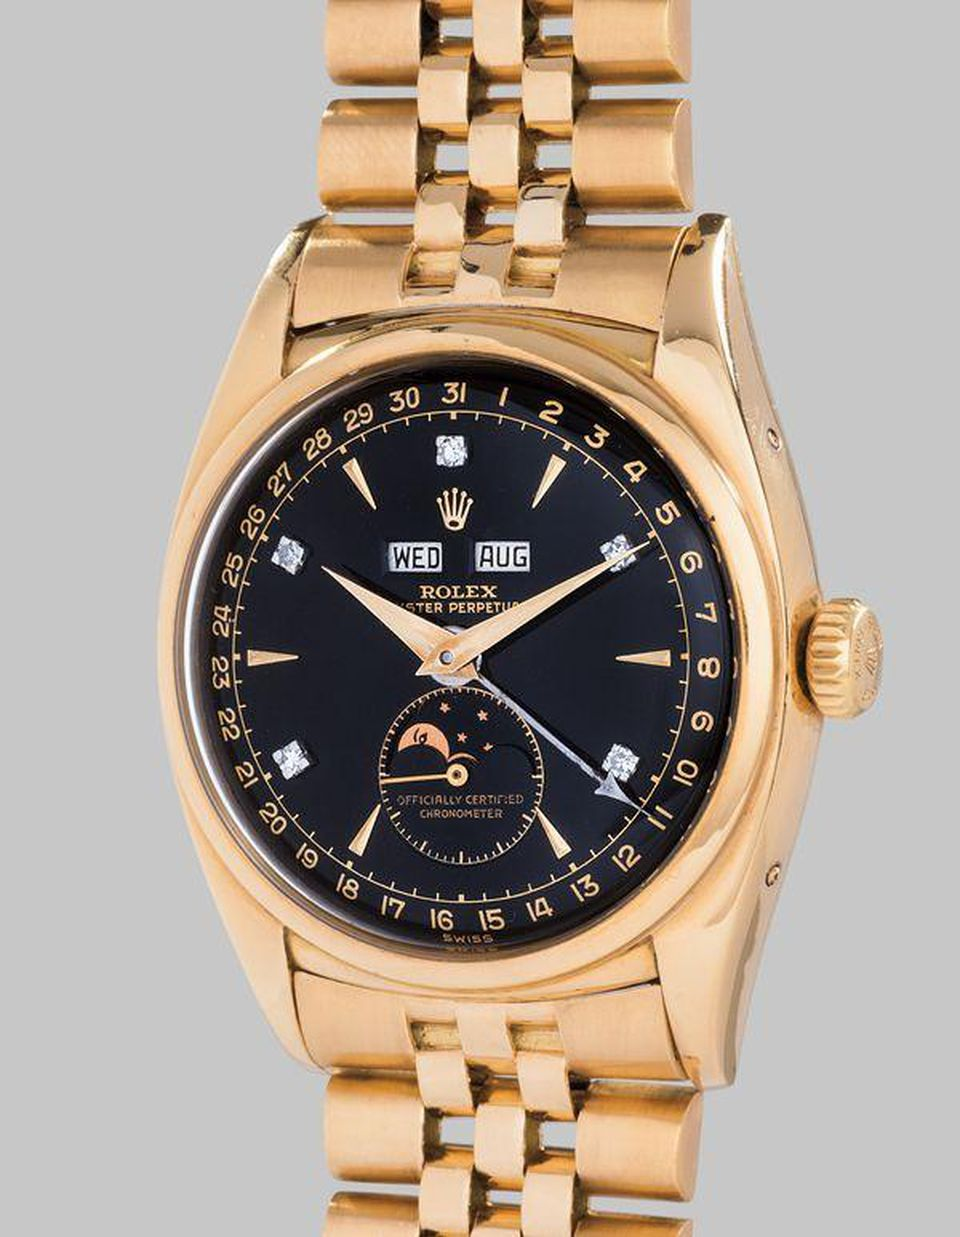 Rolex Ref. 6062, image via Phillips.com